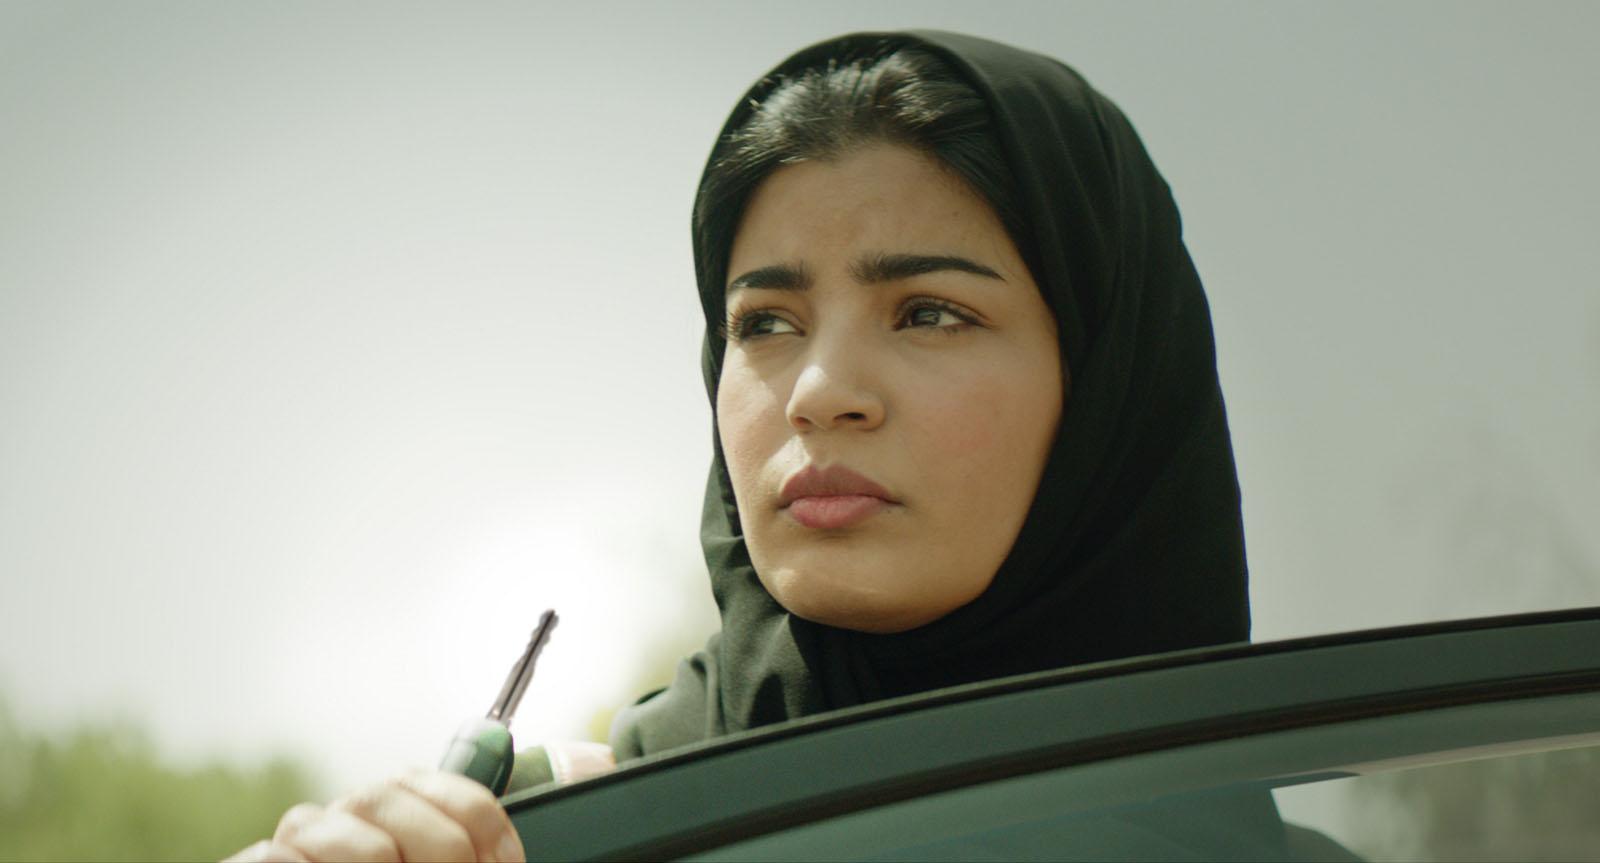 La candidata perfecta, dirigida por Haifaa Al Mansour